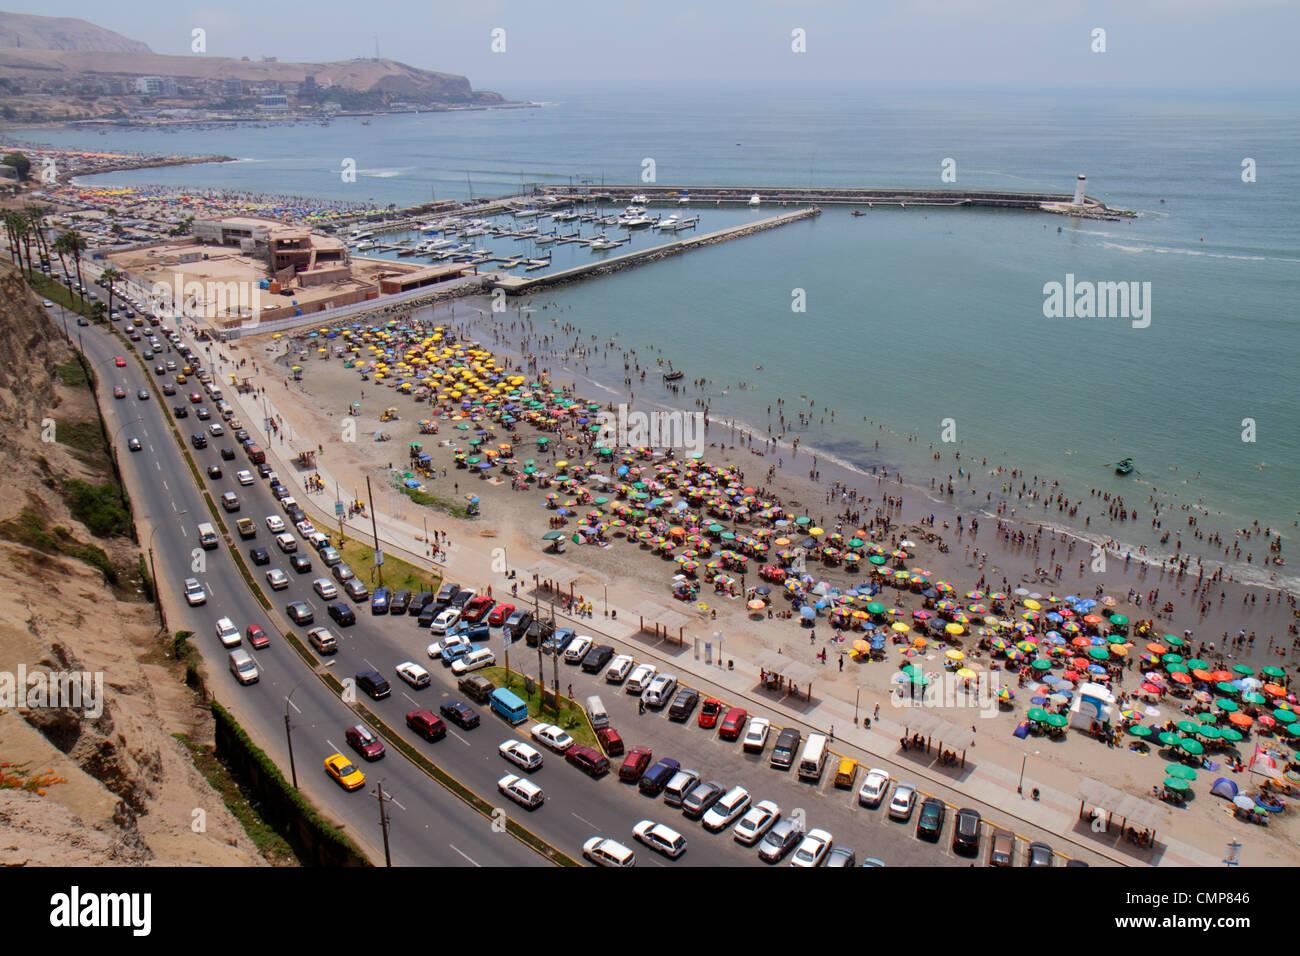 Peru Lima Barranco District Malecon Circuito De Playas Playa Los Stock Photo Alamy